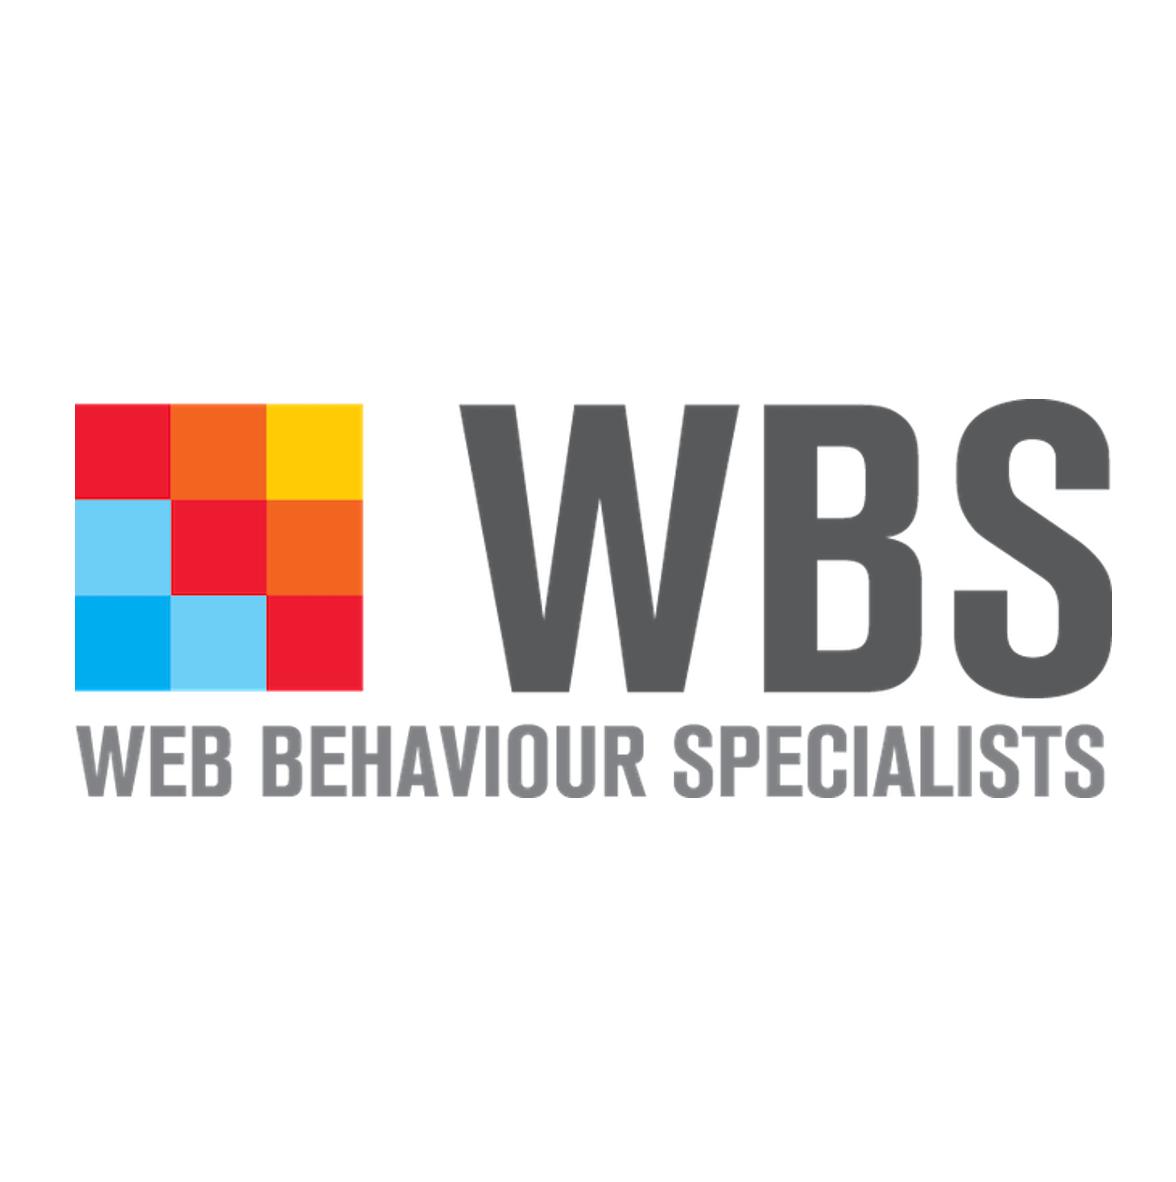 Web-Behaviour Specialists